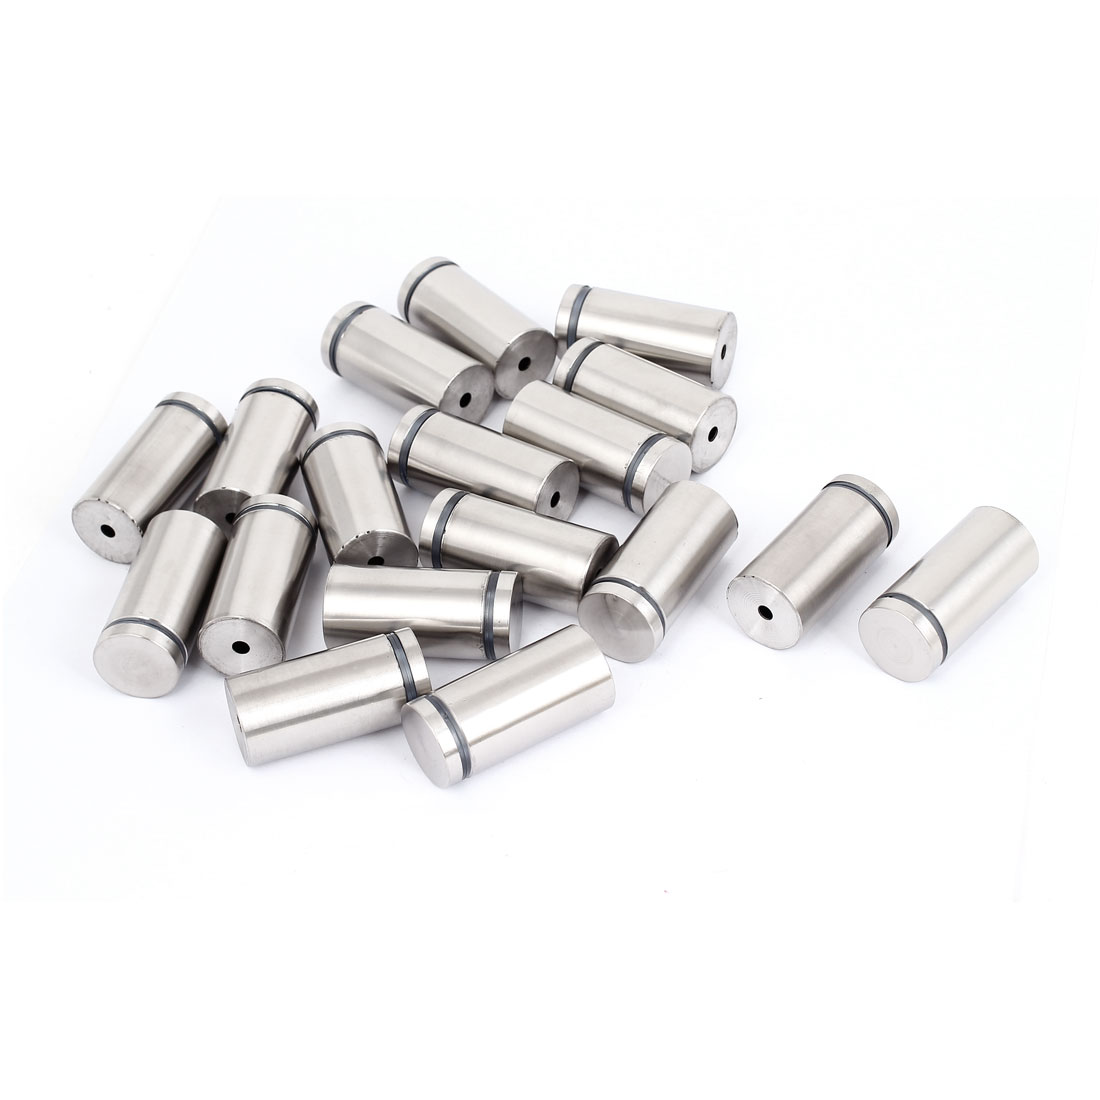 25mm x 50mm Stainless Steel Advertising Frameless Glass Standoff Pins 18pcs